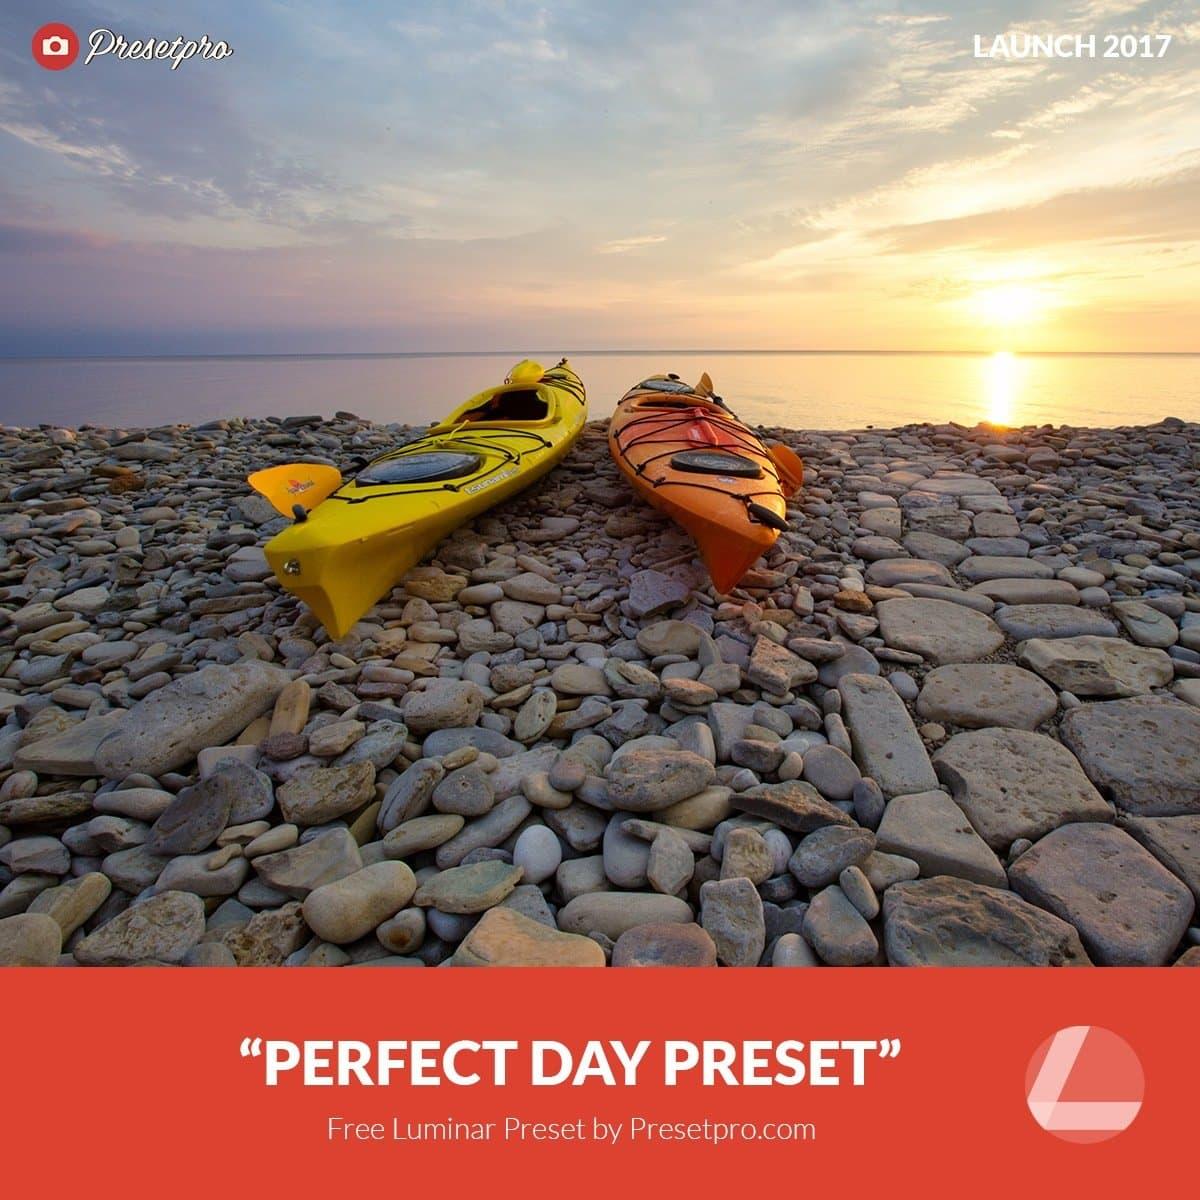 Free-Luminar-Preset-Perfect-Day